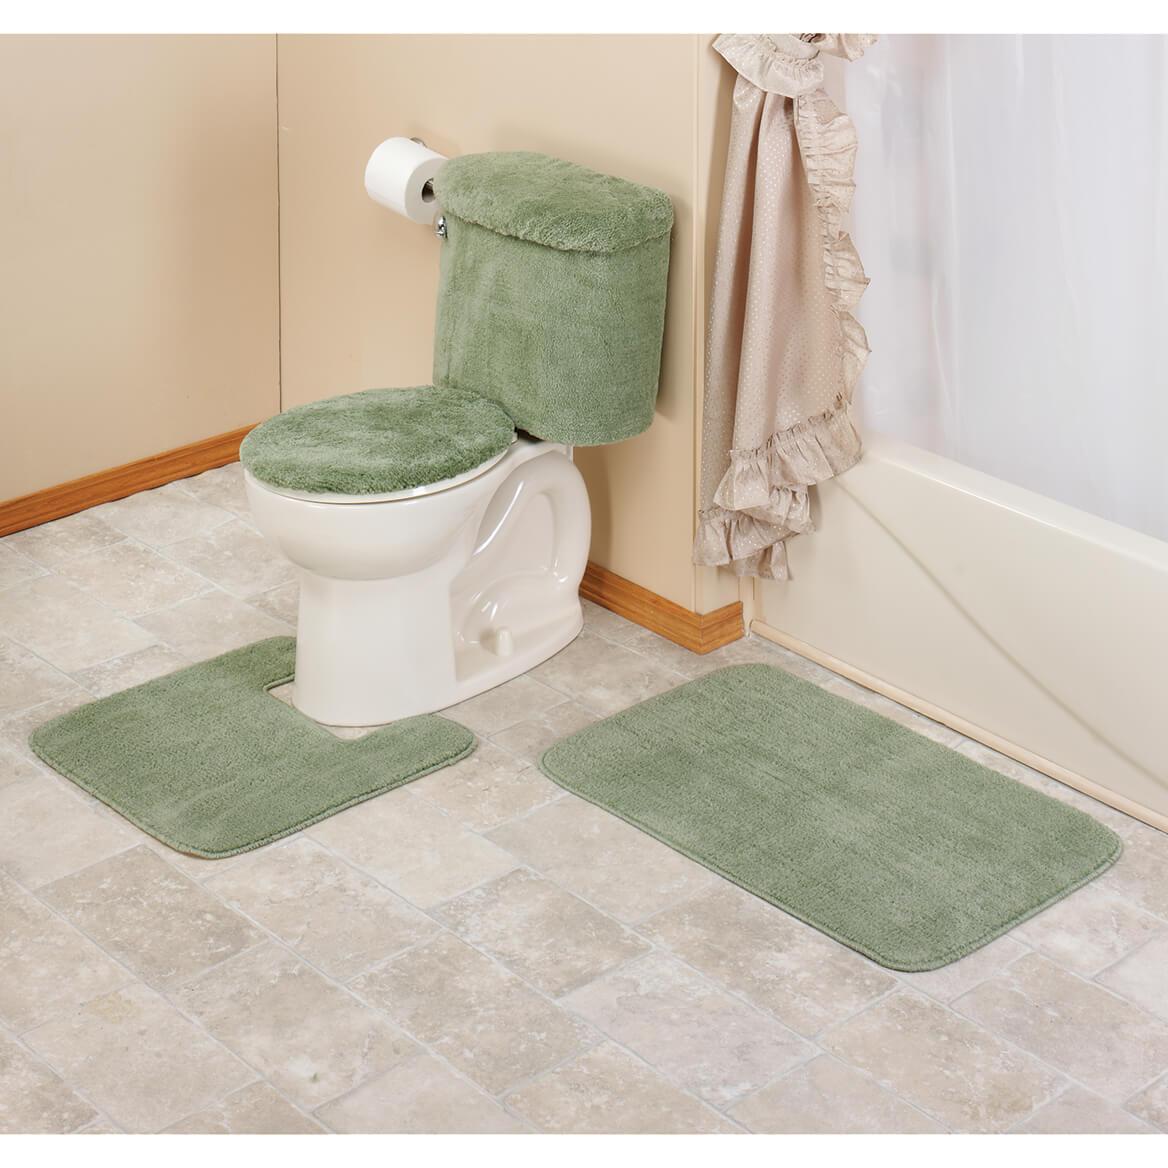 5 Piece Bath Set - 5 Piece Bathroom Set - Miles Kimball